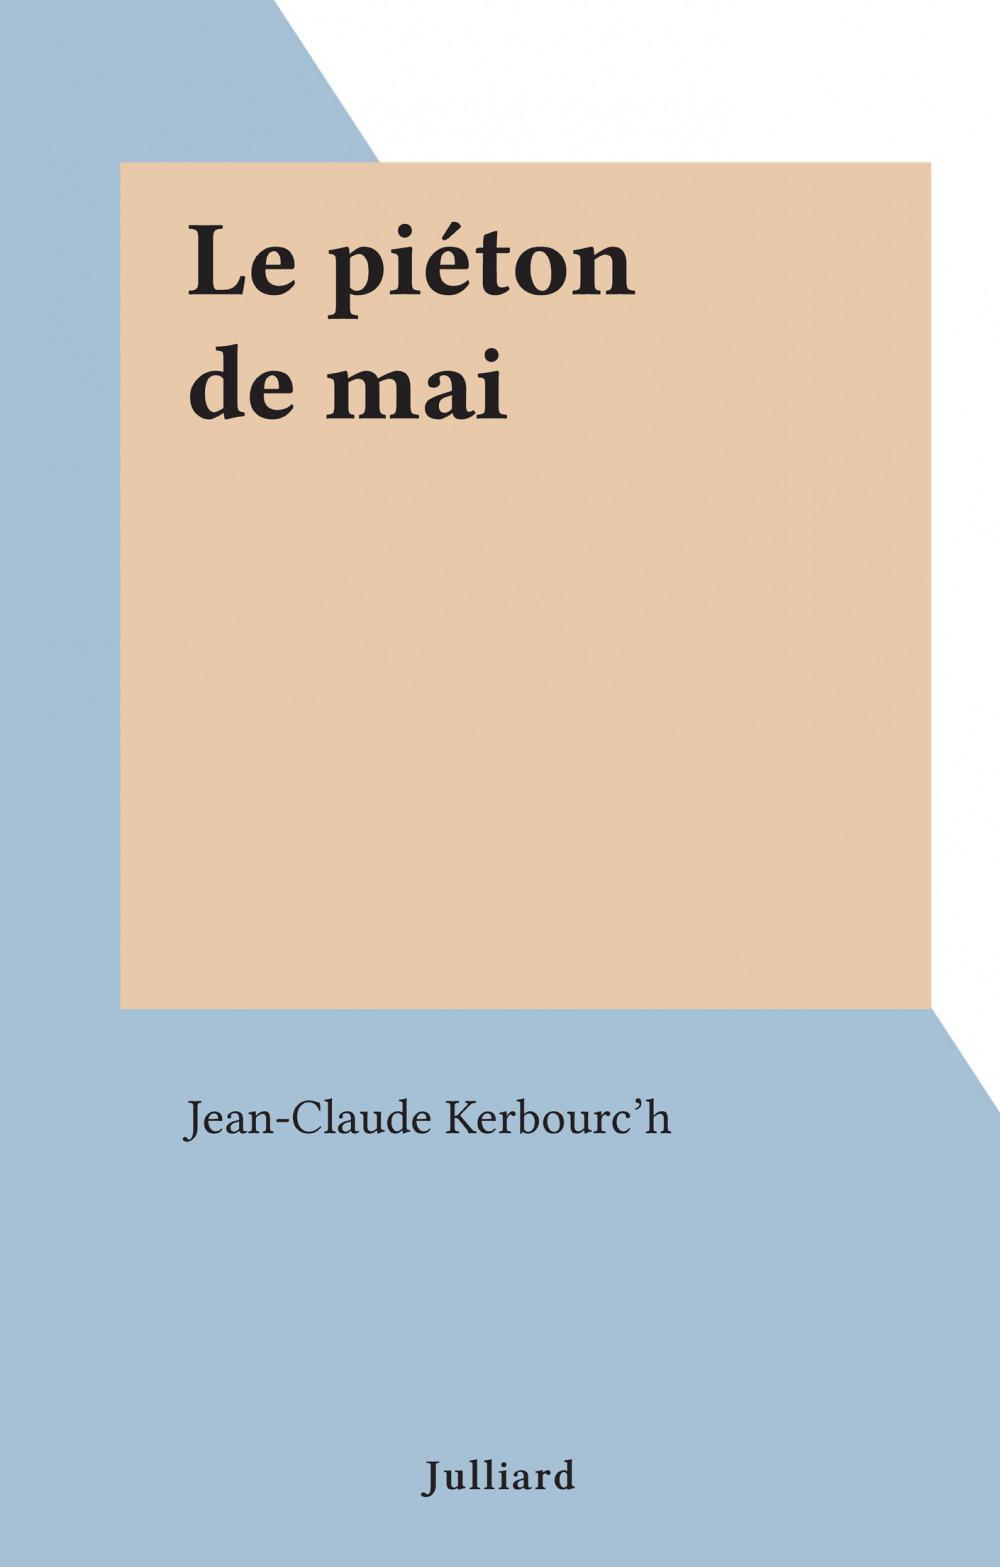 Le piéton de mai  - Jean-Claude Kerbourc'h